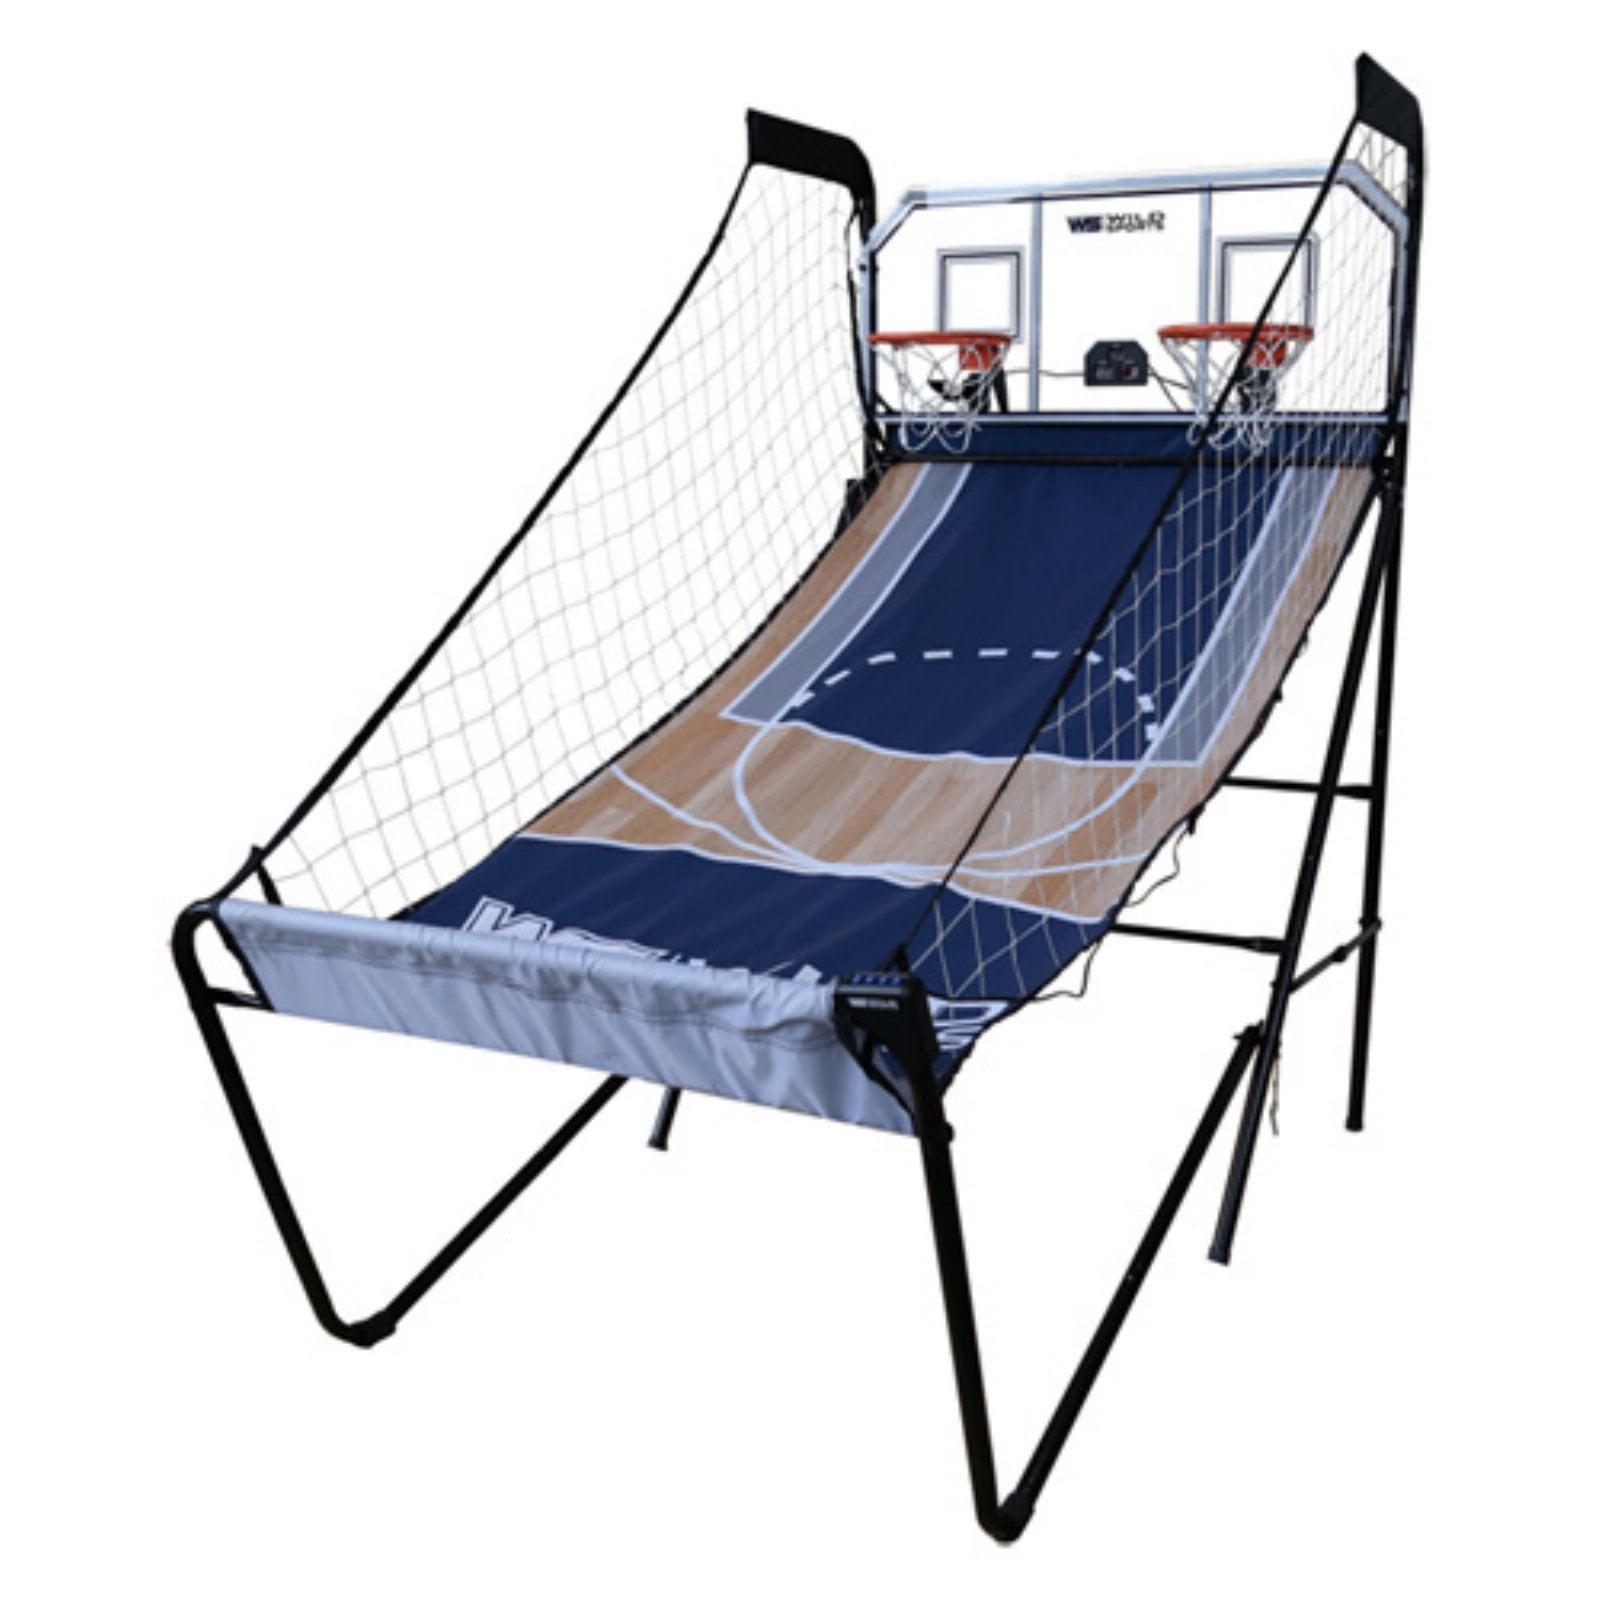 Wild Sports Arcade Basketball Game System – Walmart Inventory